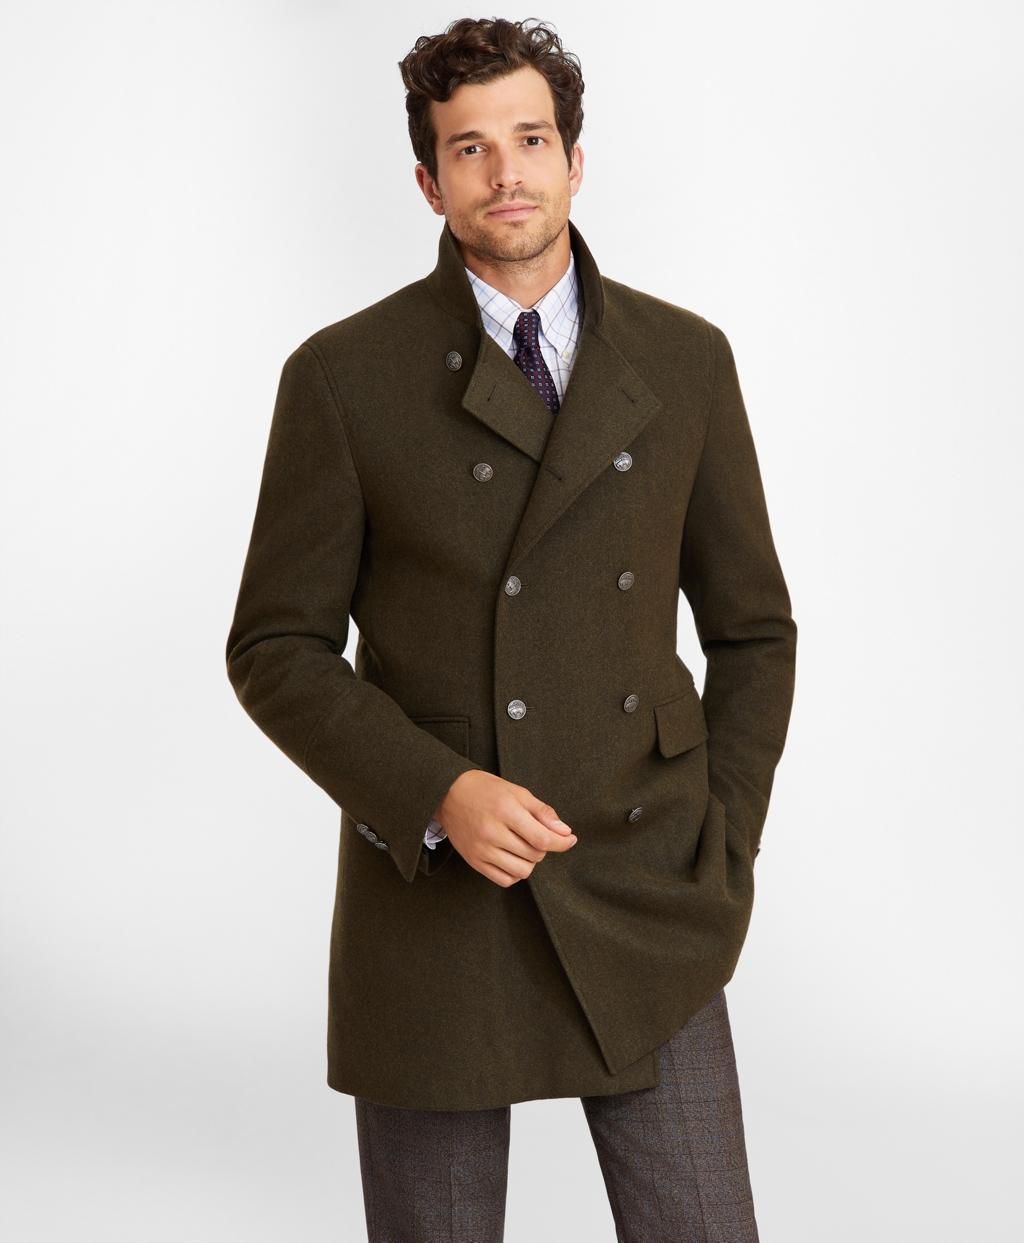 60s 70s Men's Jackets & Sweaters Brooks Brothers Mens Wool-Blend Topcoat $698.00 AT vintagedancer.com